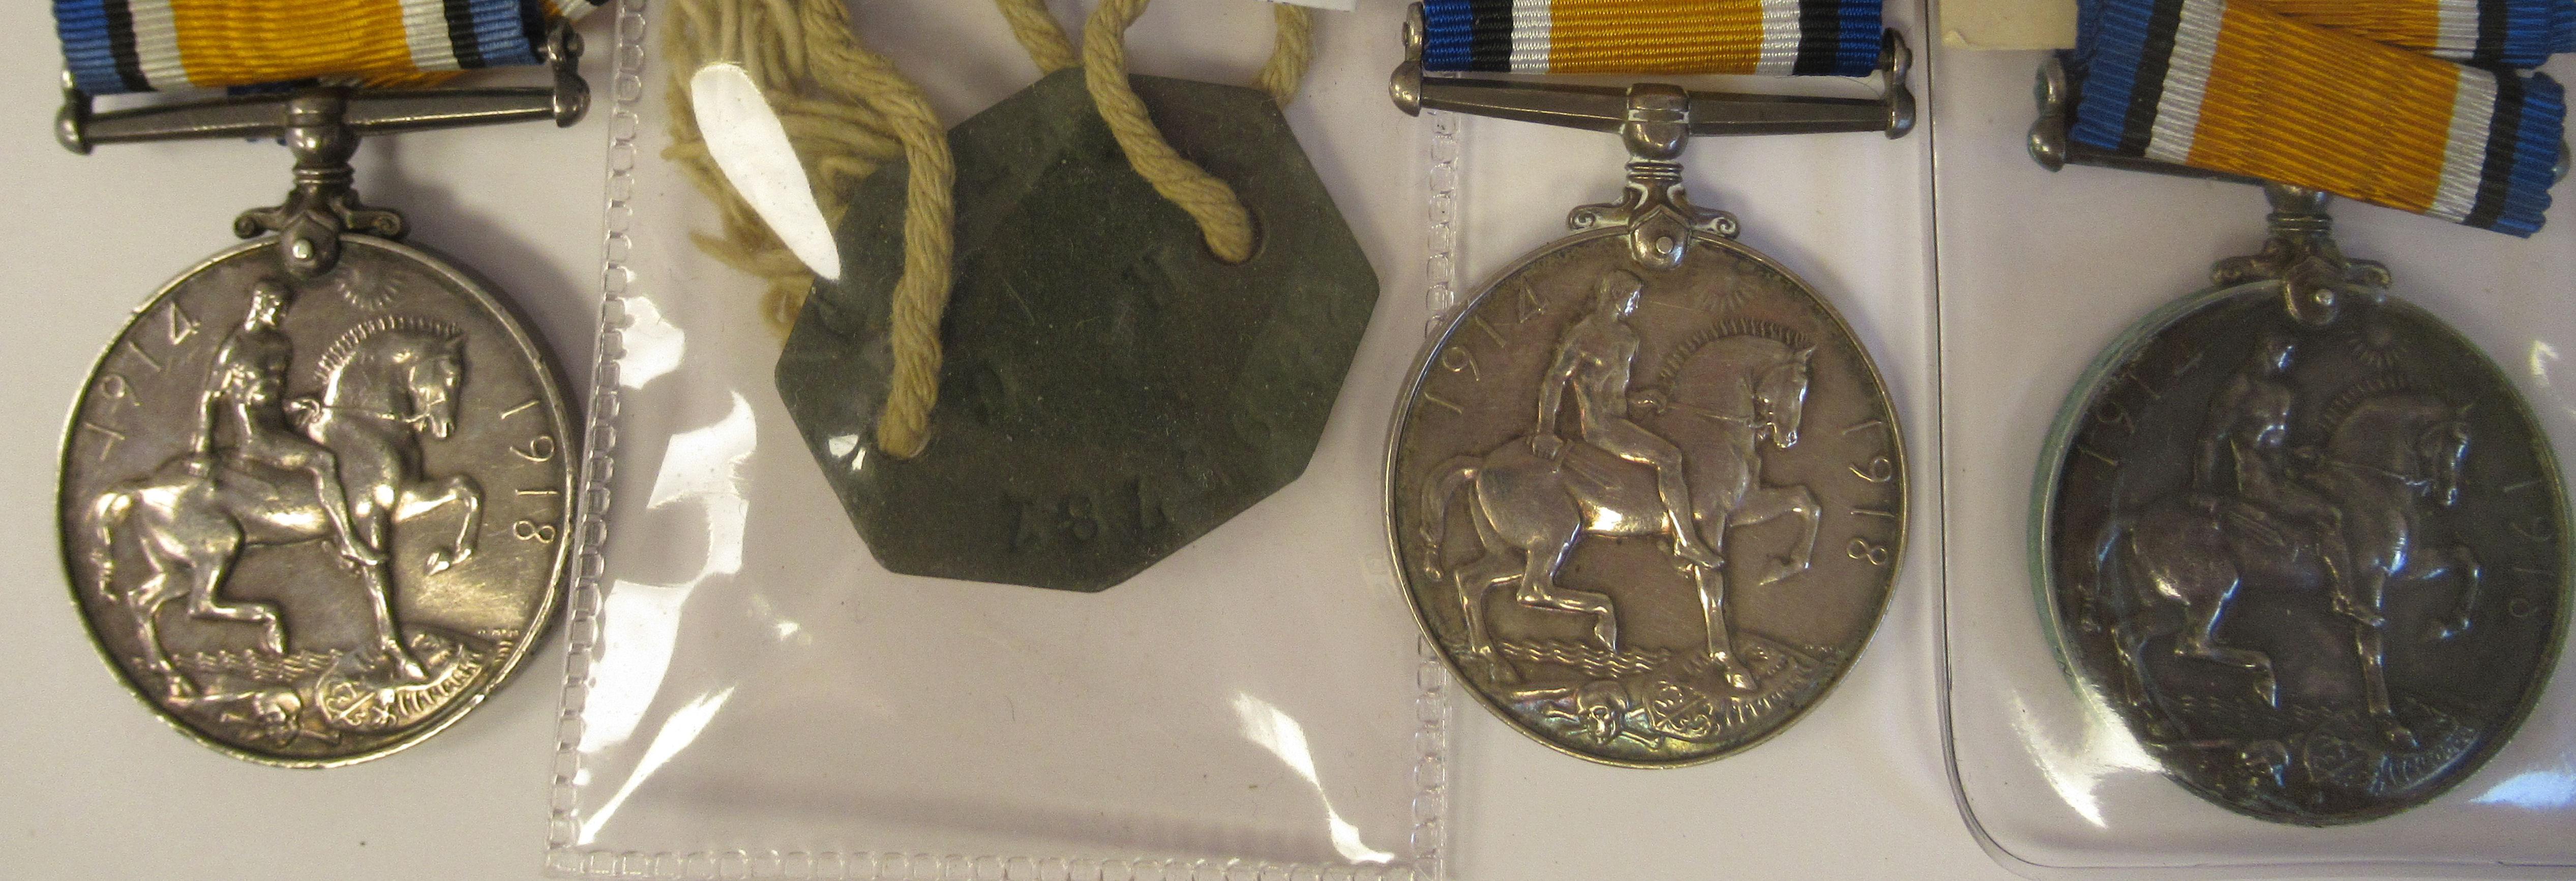 Twenty-four Great War 1914-1918 British service medals on ribbons, viz. 46481, Gnr. E. Williamson - Image 12 of 16